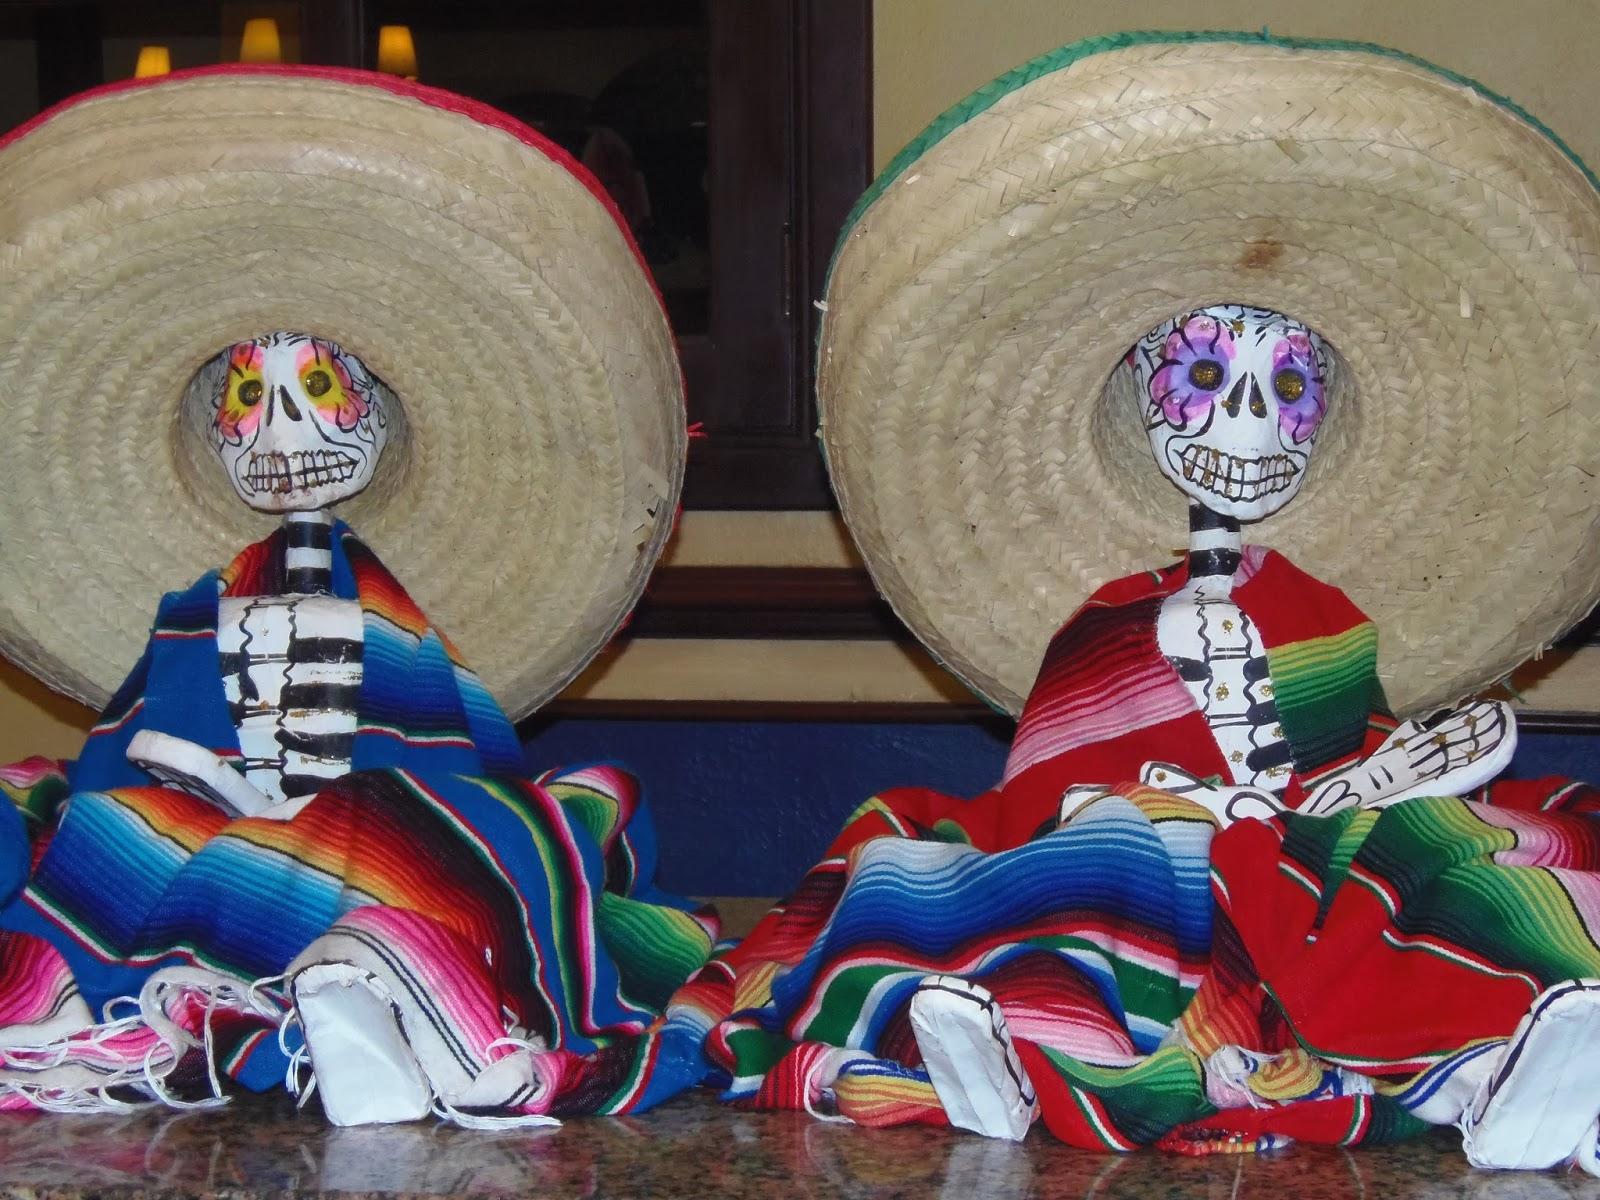 mexico, food, buffet, travel, traveling, holiday, playa del carmen, playacar